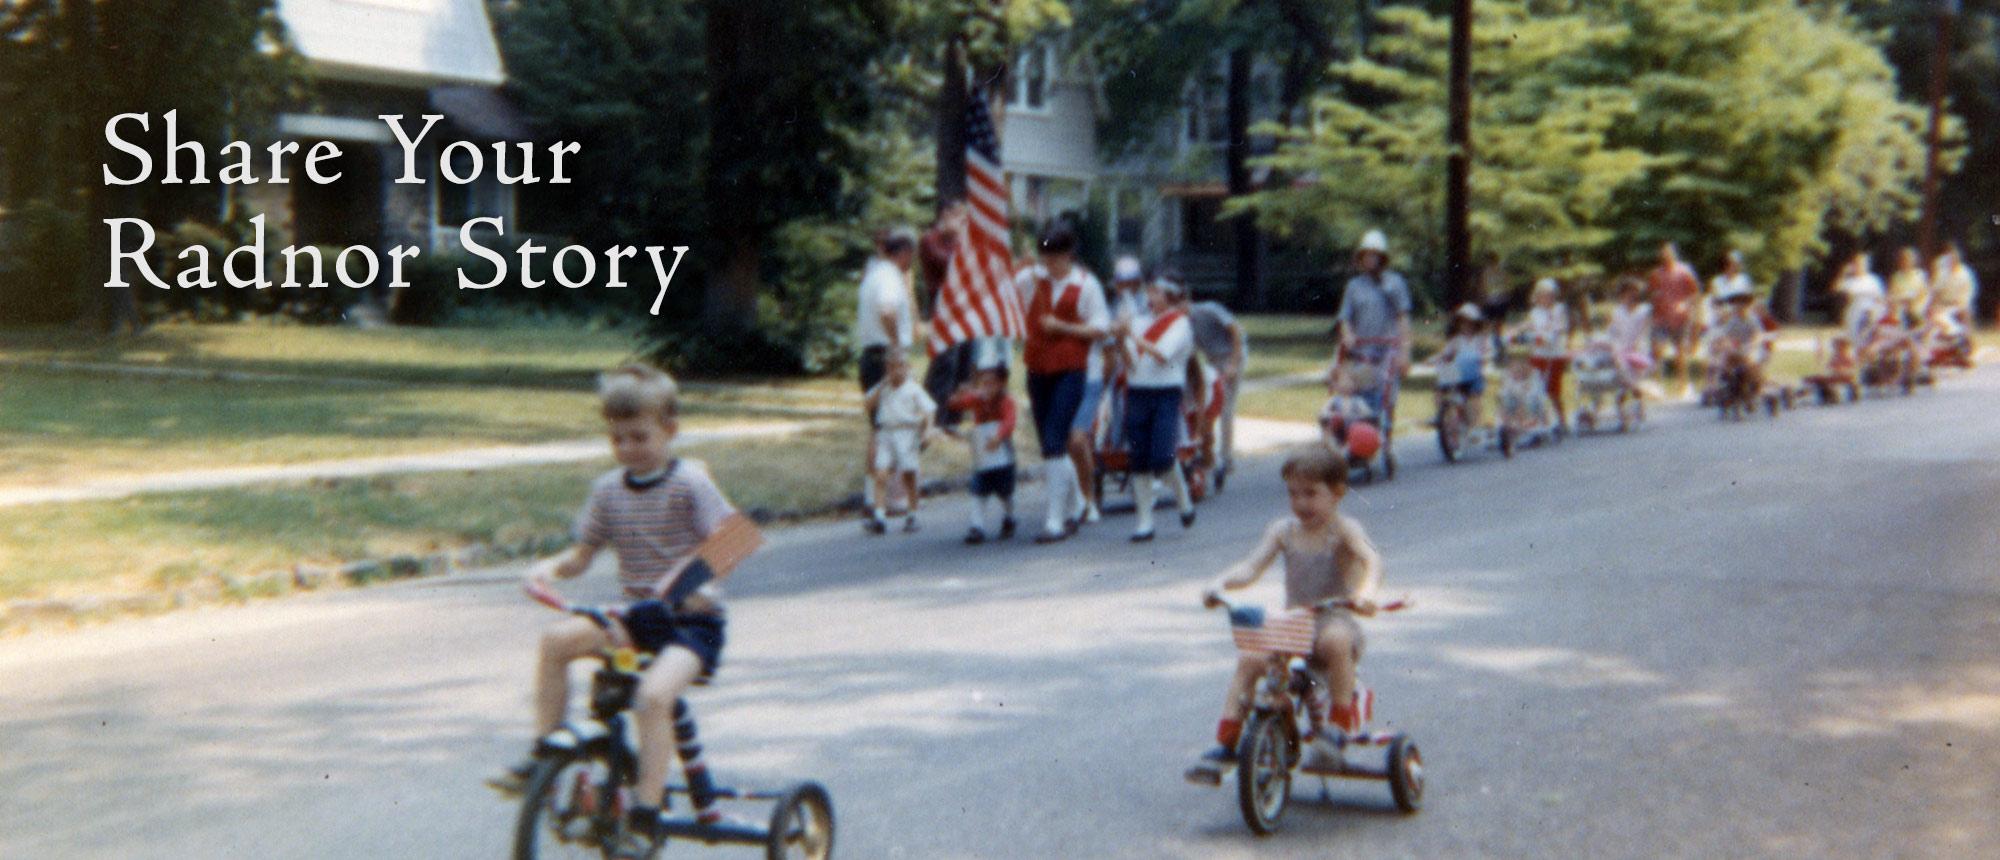 home-slideshow-radnor-story